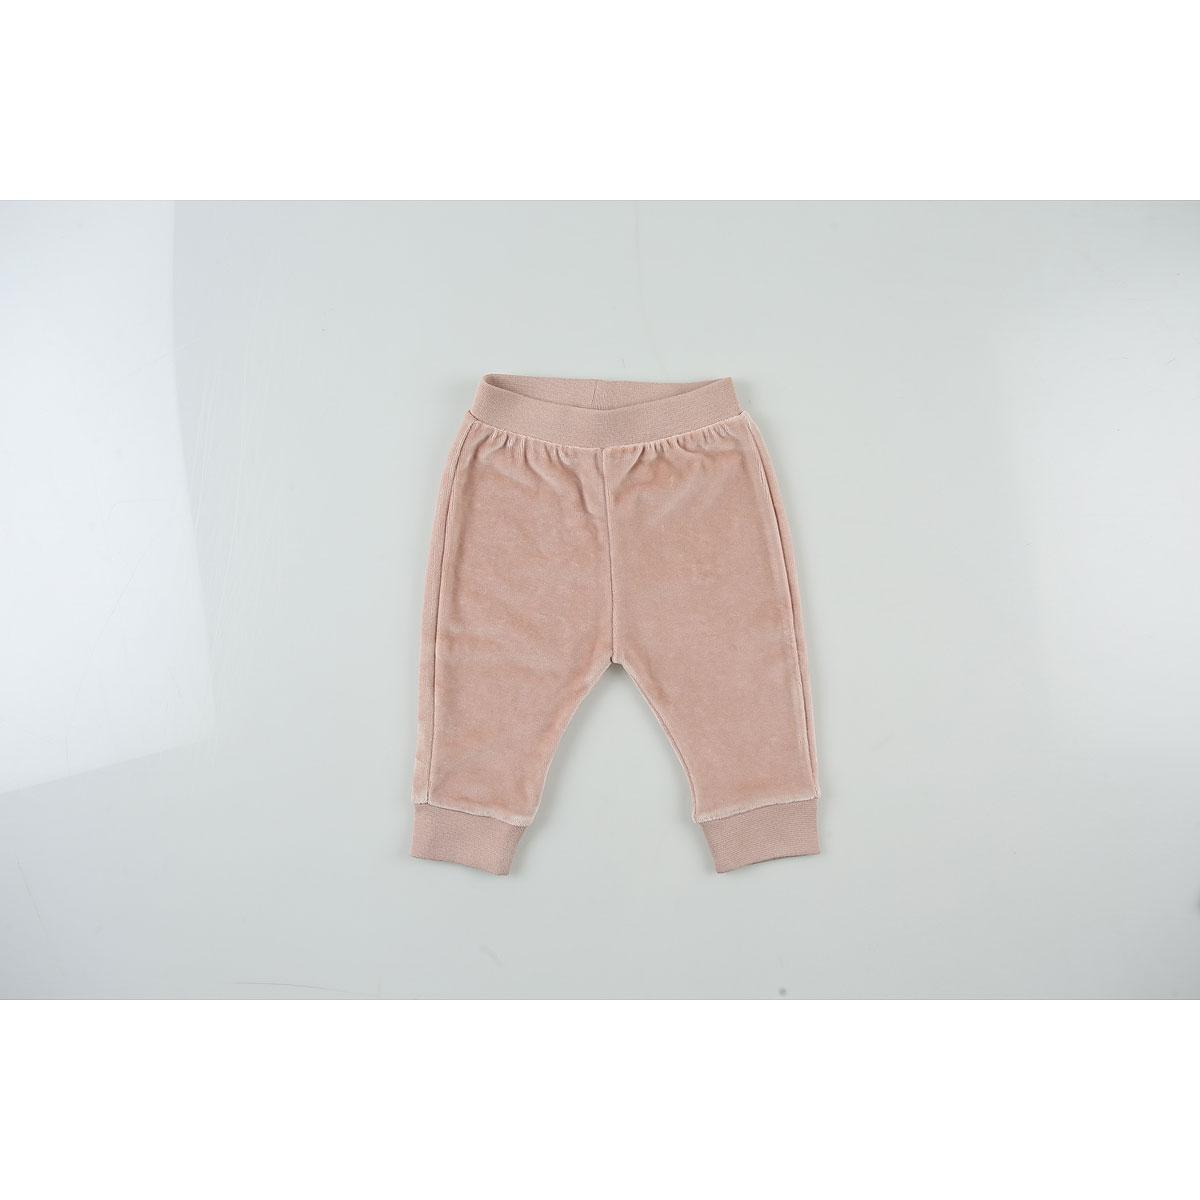 Image of Stella McCartney Baby Sweatpants for Girls, Pink, Cotton, 2017, 12M 18M 2Y 6M 9M